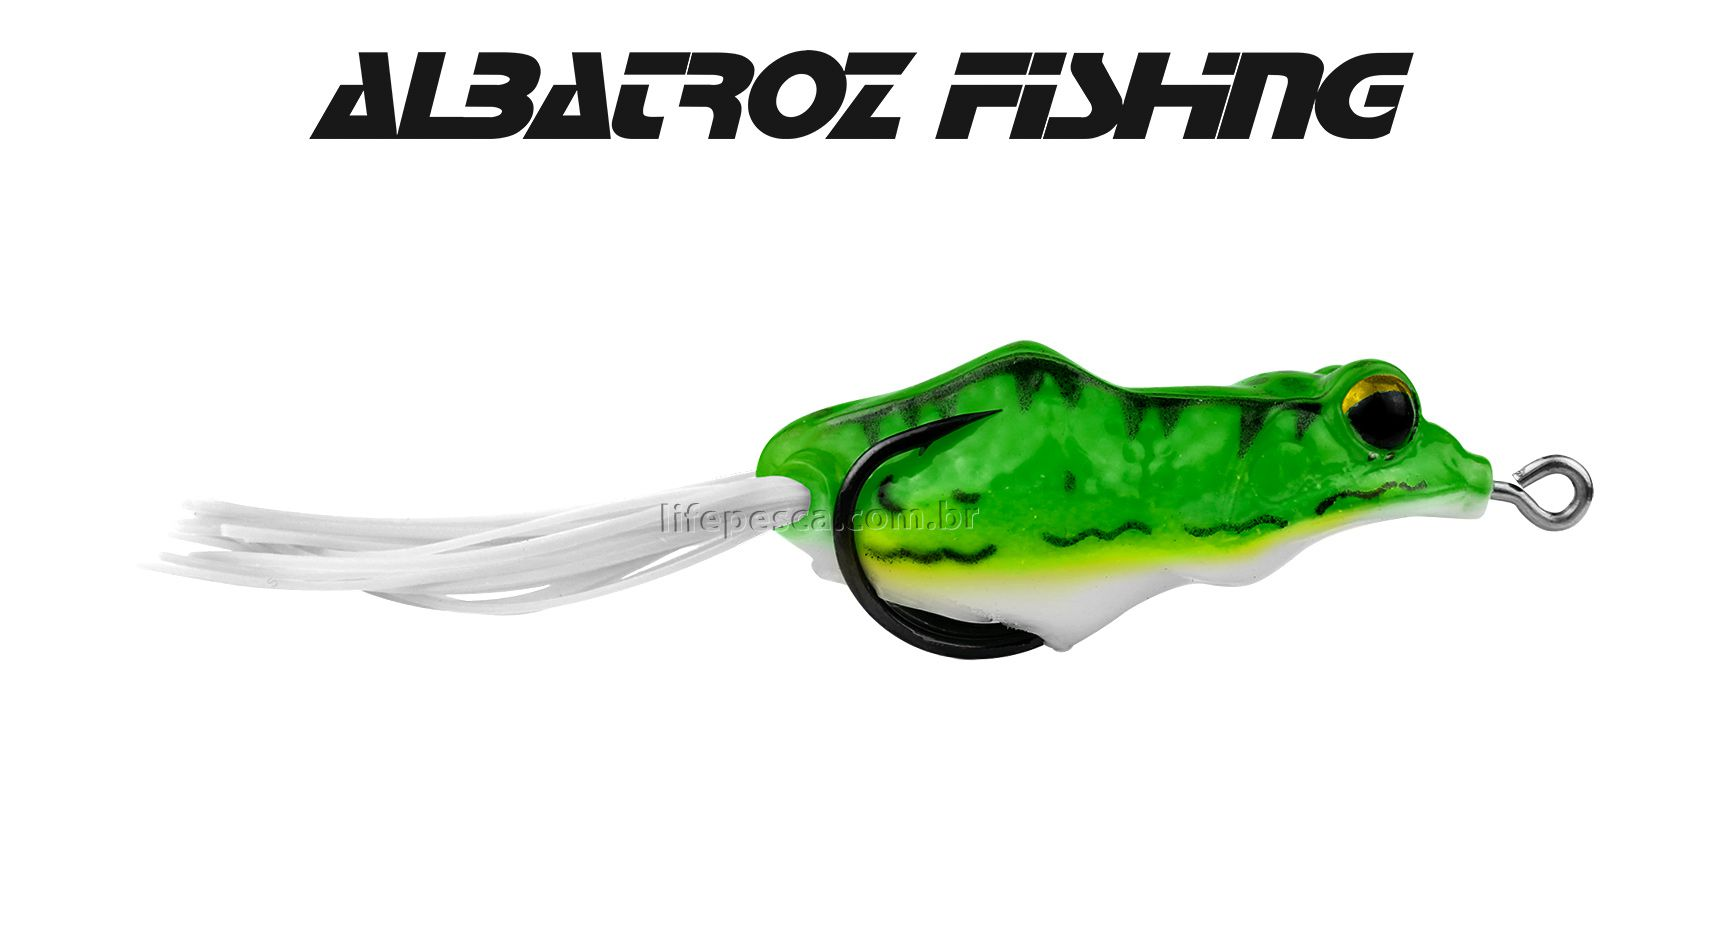 Isca Artificial Albatroz Fishing Top Frog XY-39 - 5,5cm (9,5g) - Várias Cores